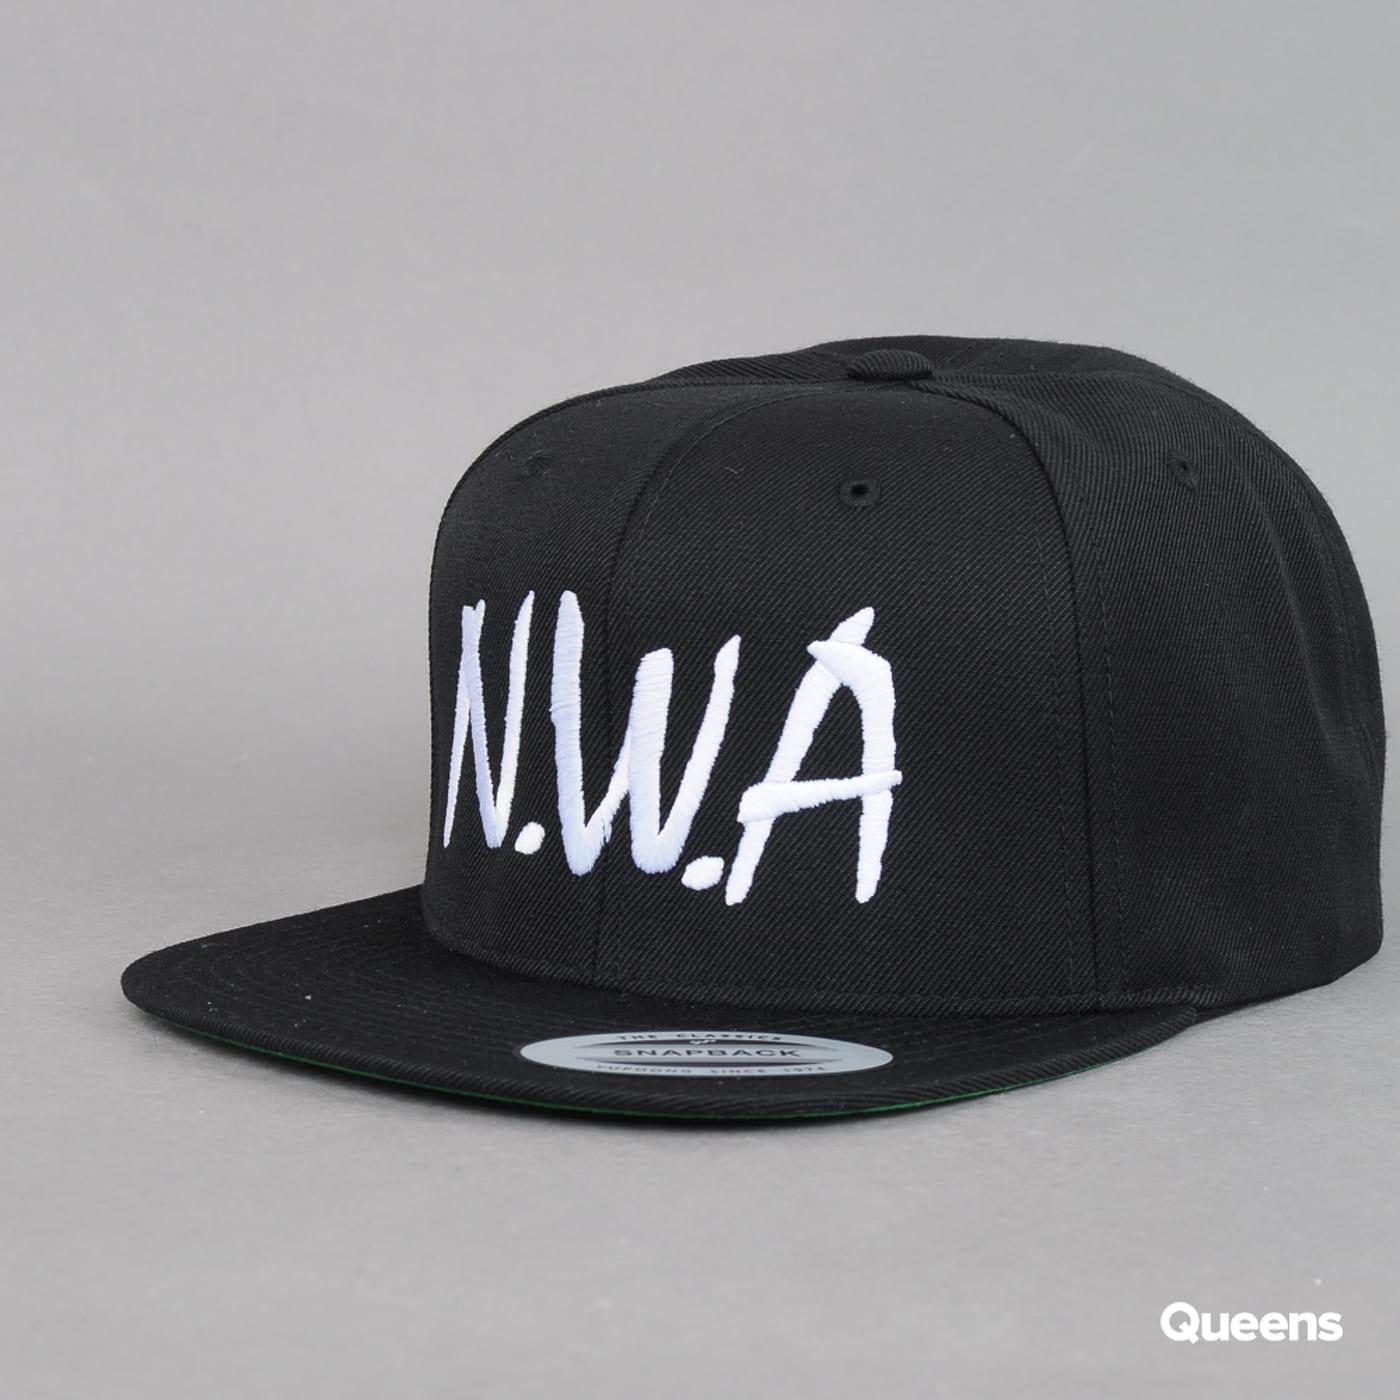 Yupoong N.W.A. Cap schwarz